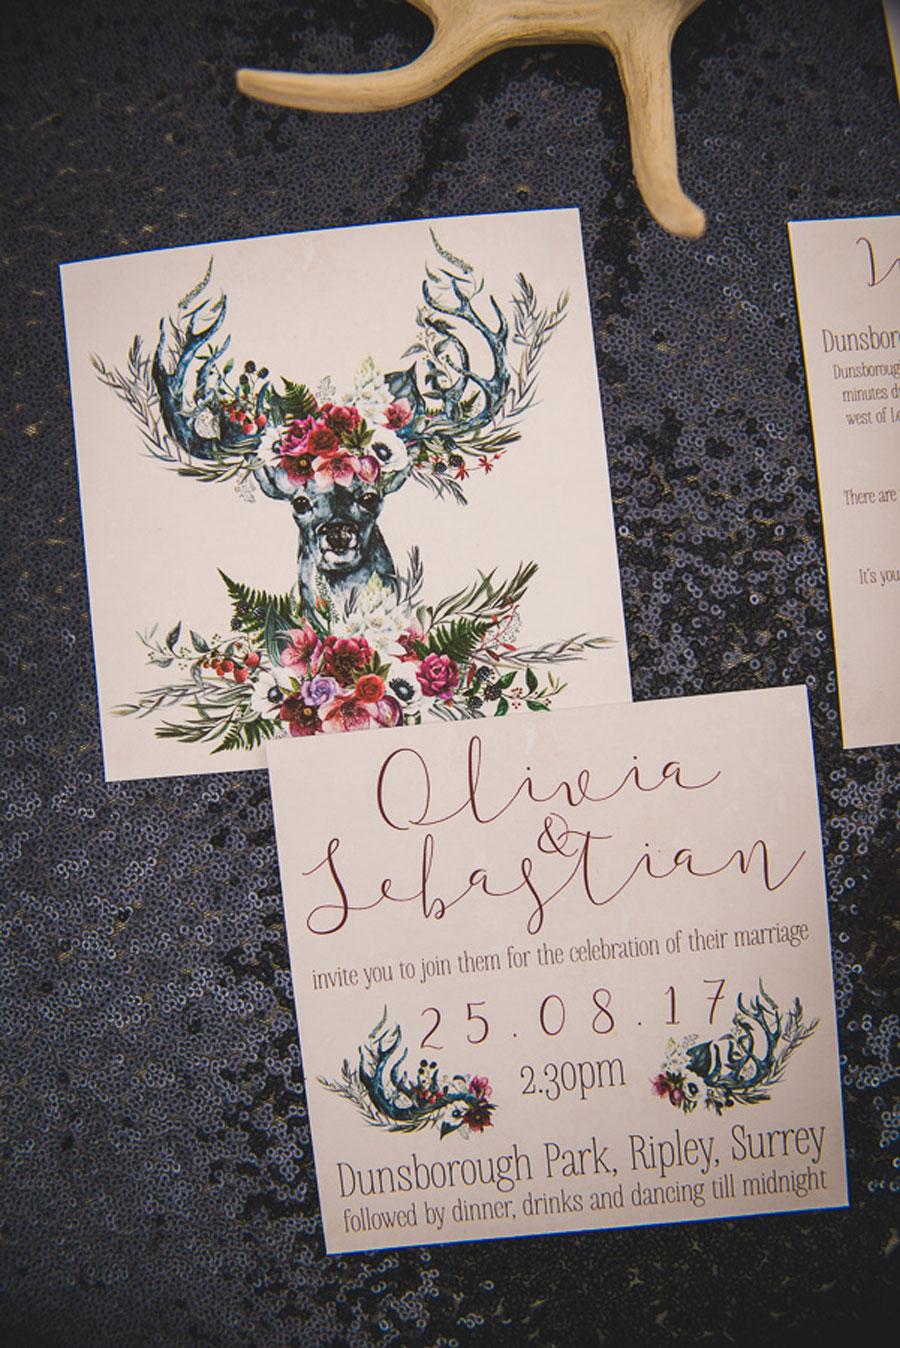 A Late Summer Renaissance-Meets-Fantasy Themed Bridal Shoot0024